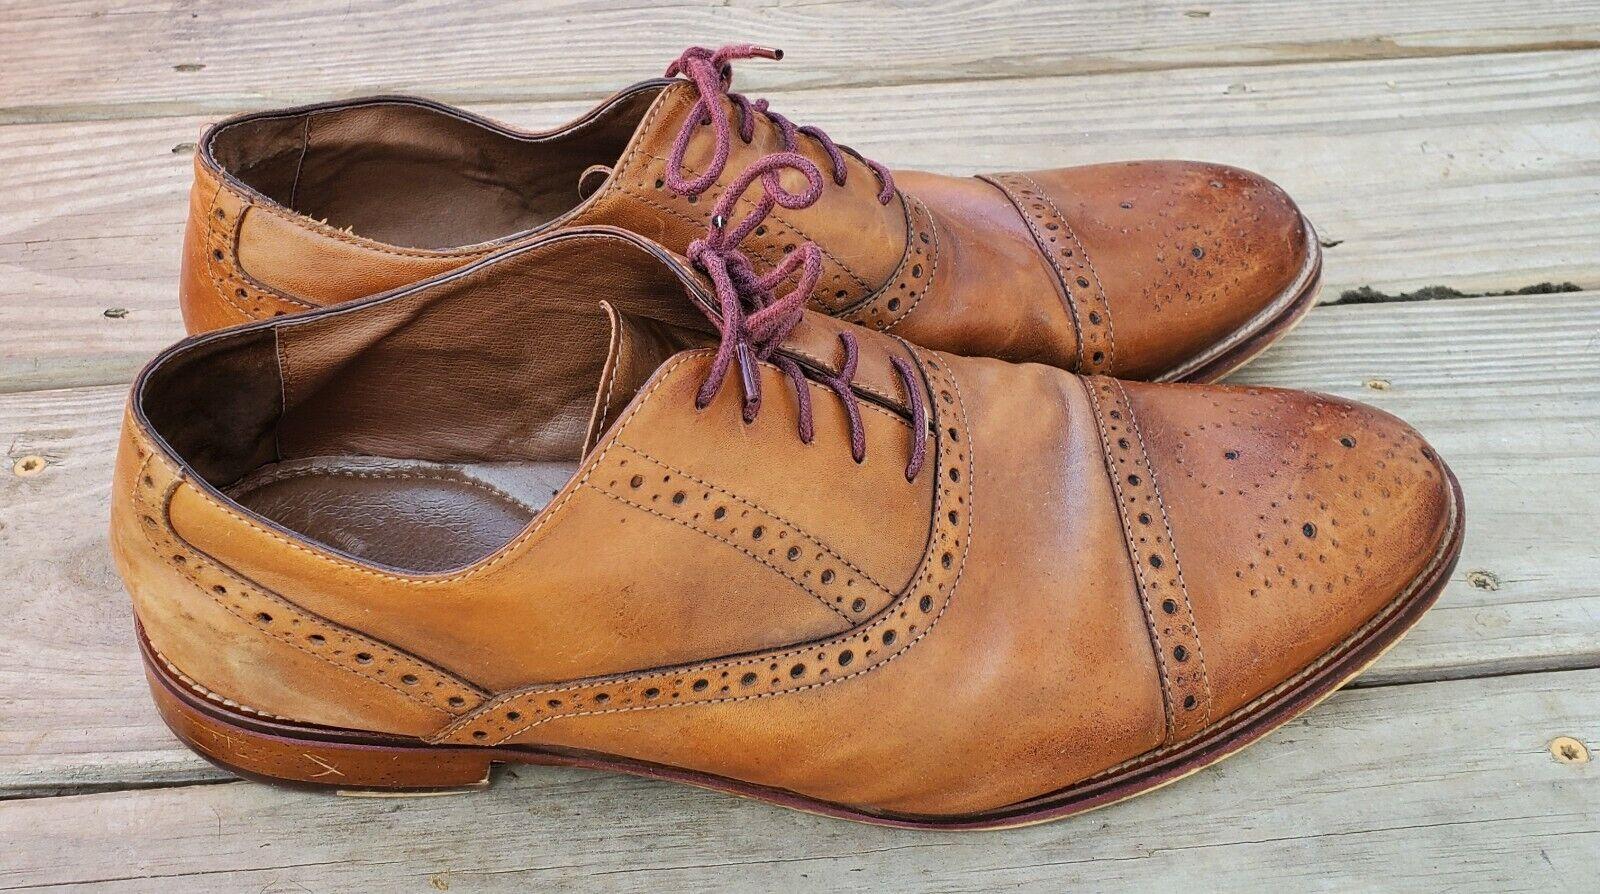 Johnston & Murphy Conard 20-8682 Tan Leather Cap Toe Dress Oxfords Shoes 13 W